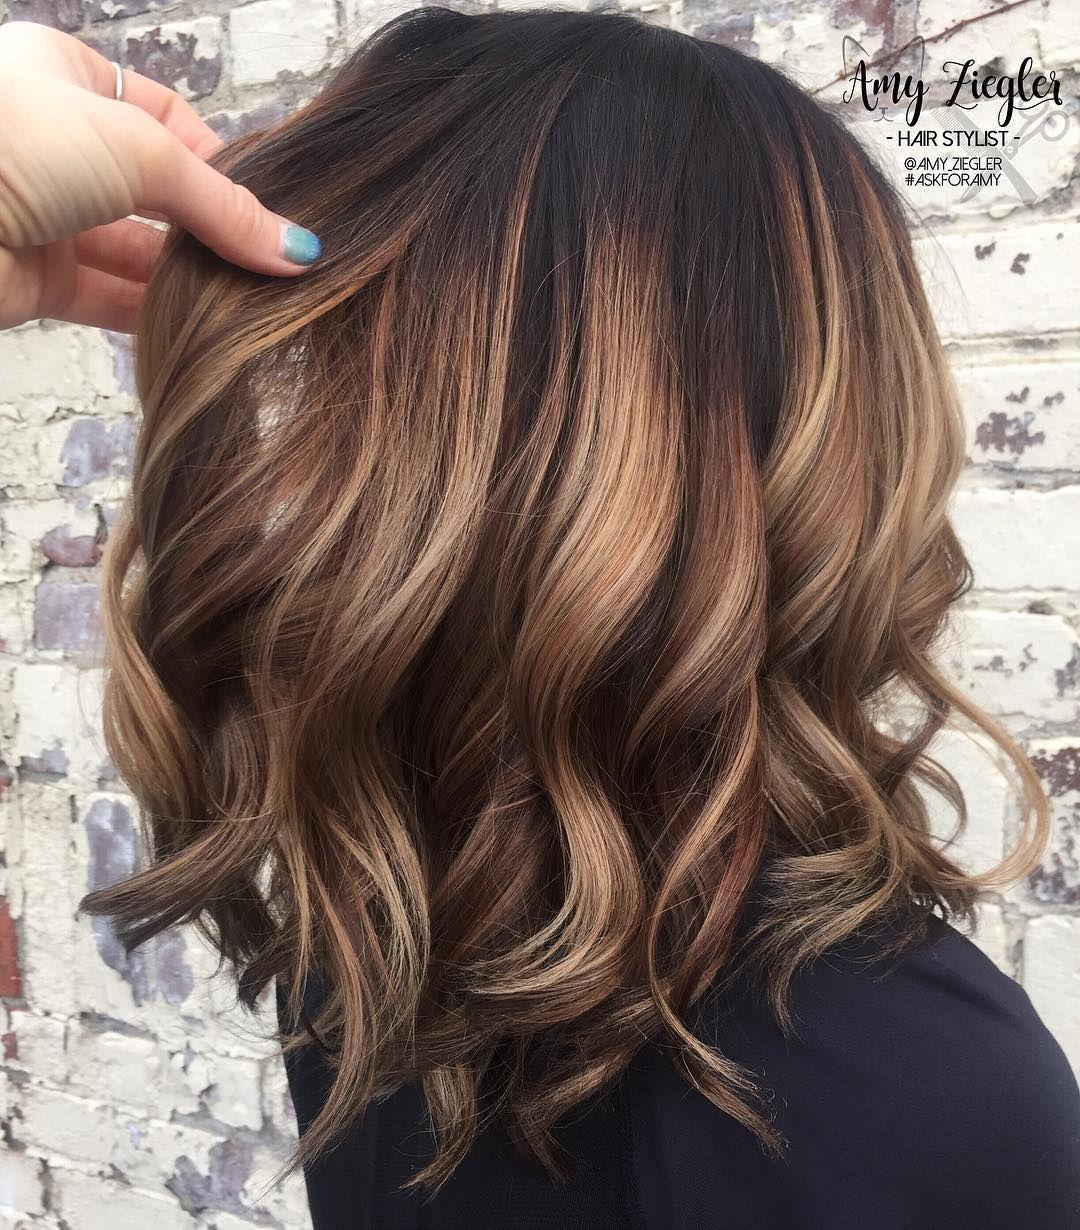 Best Brown Balayage Hair Designs For Medium Length Hair Medium Hairstyle Color Hair Styles Brown Hair Balayage Medium Hair Styles